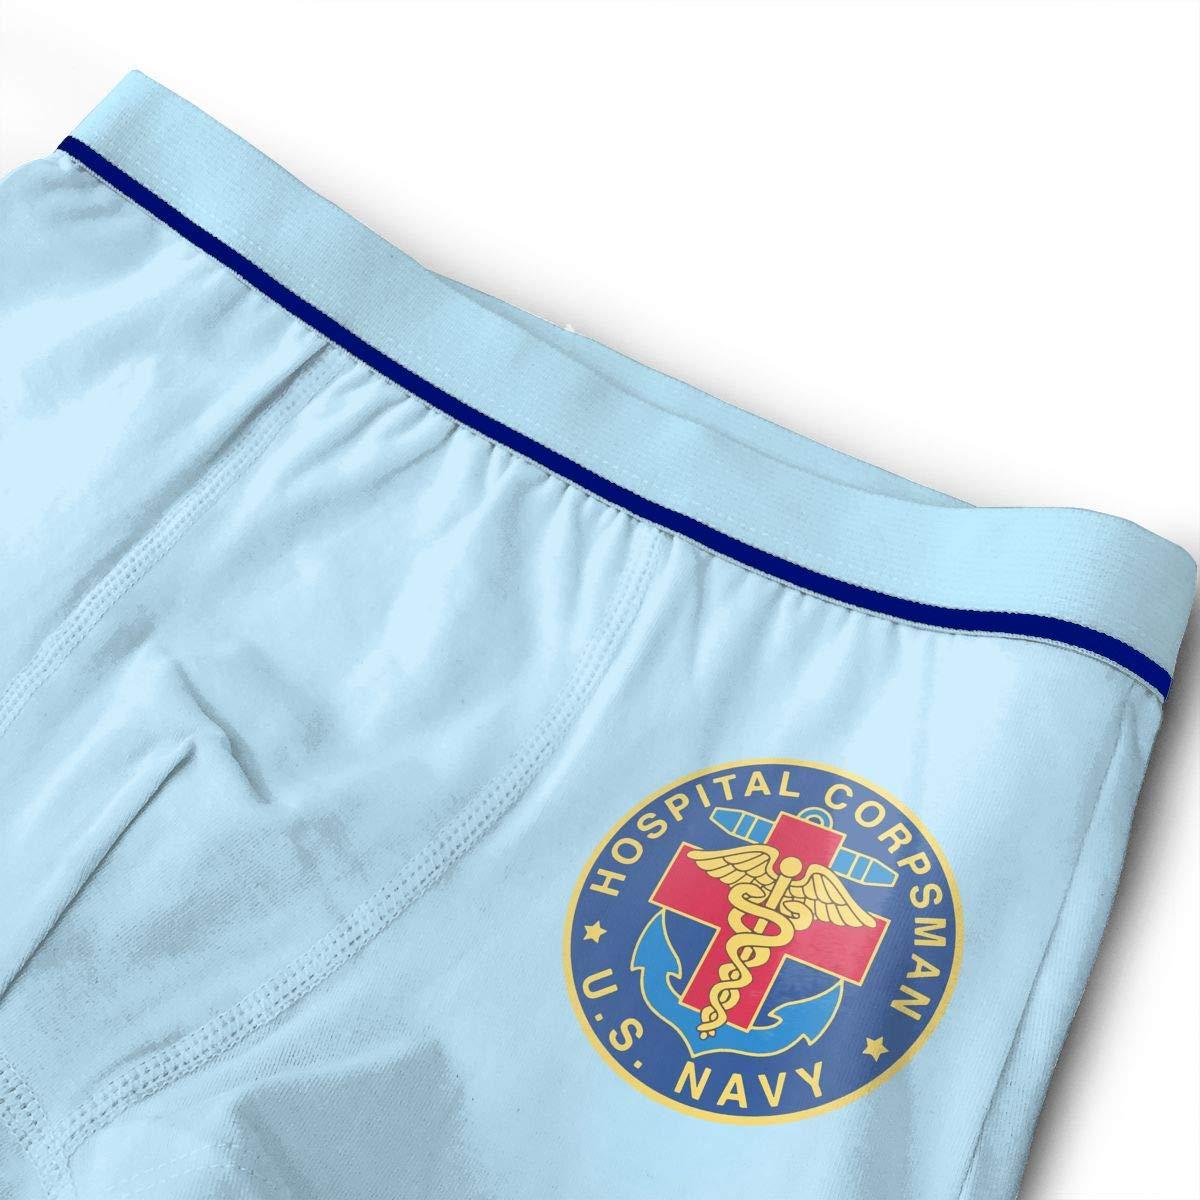 Raingningsning Police /& Firefighter /& EMT Boys Cotton Boxer Briefs Underwear